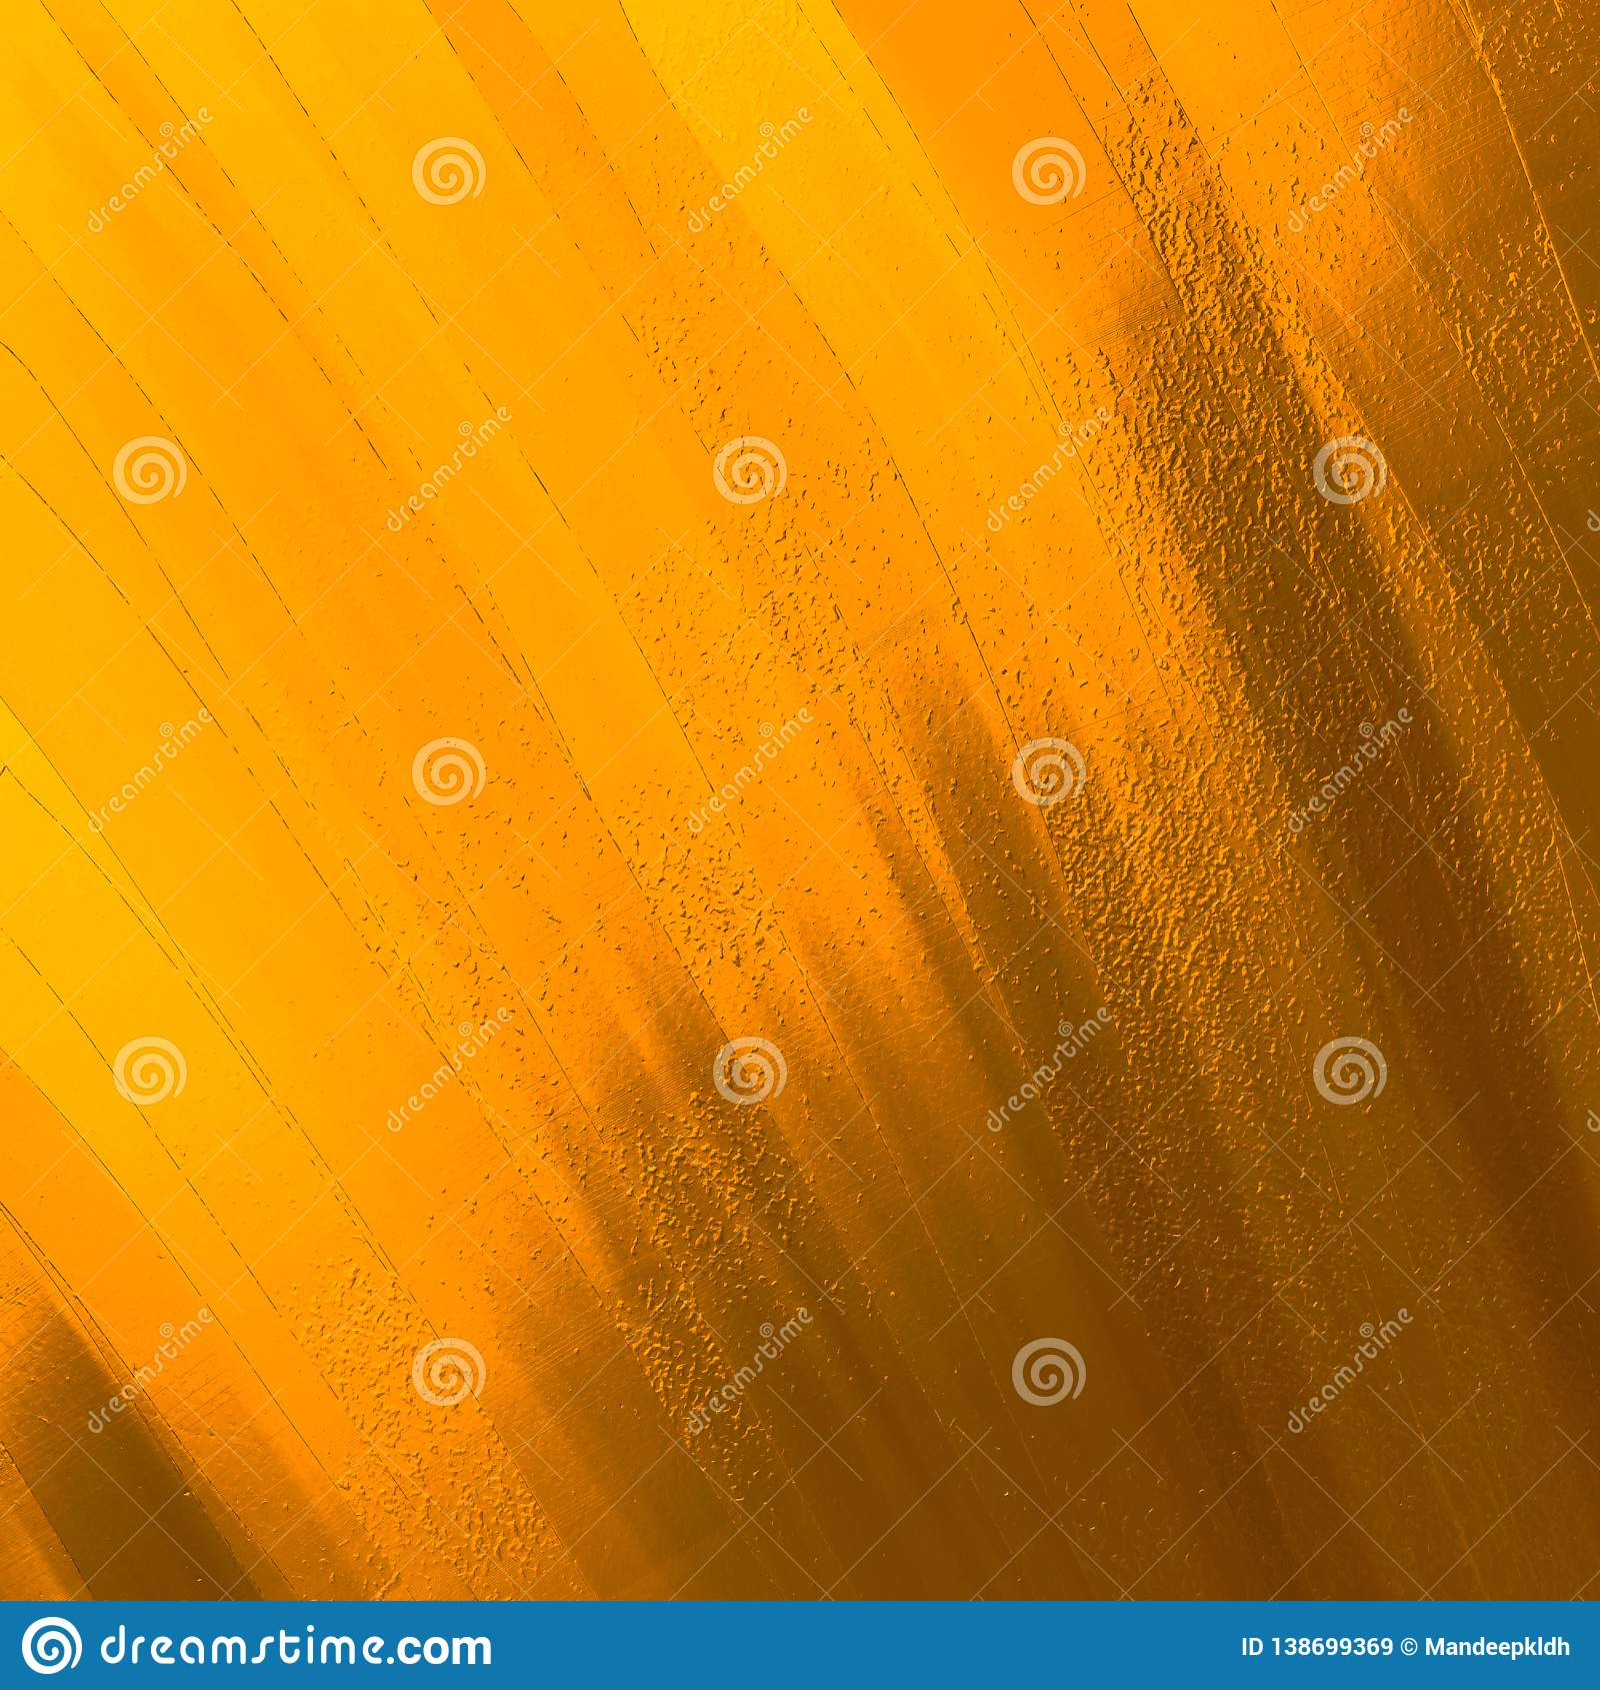 Glitterykwaststreken abstracte achtergrond Modern Art Texture Dik verfdocument voor creatieve blikken, thema s, achtergrond, affi